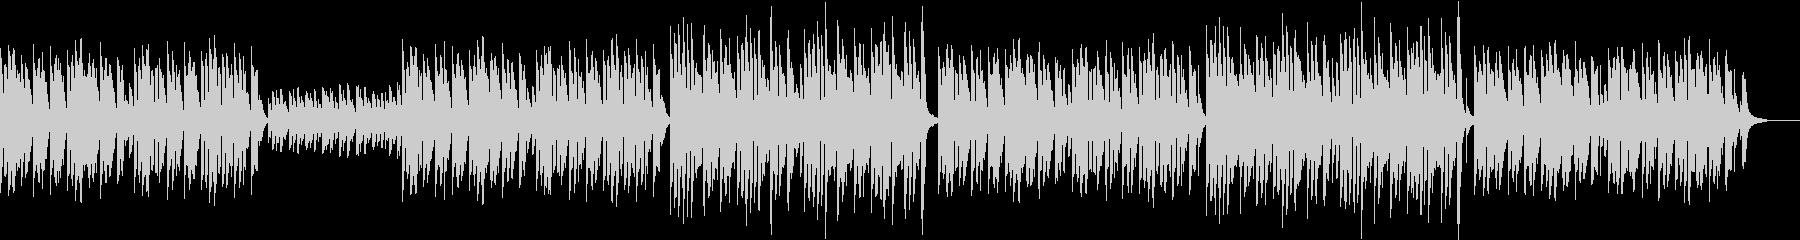 bpm112 キッズTikTok可愛い笛の未再生の波形